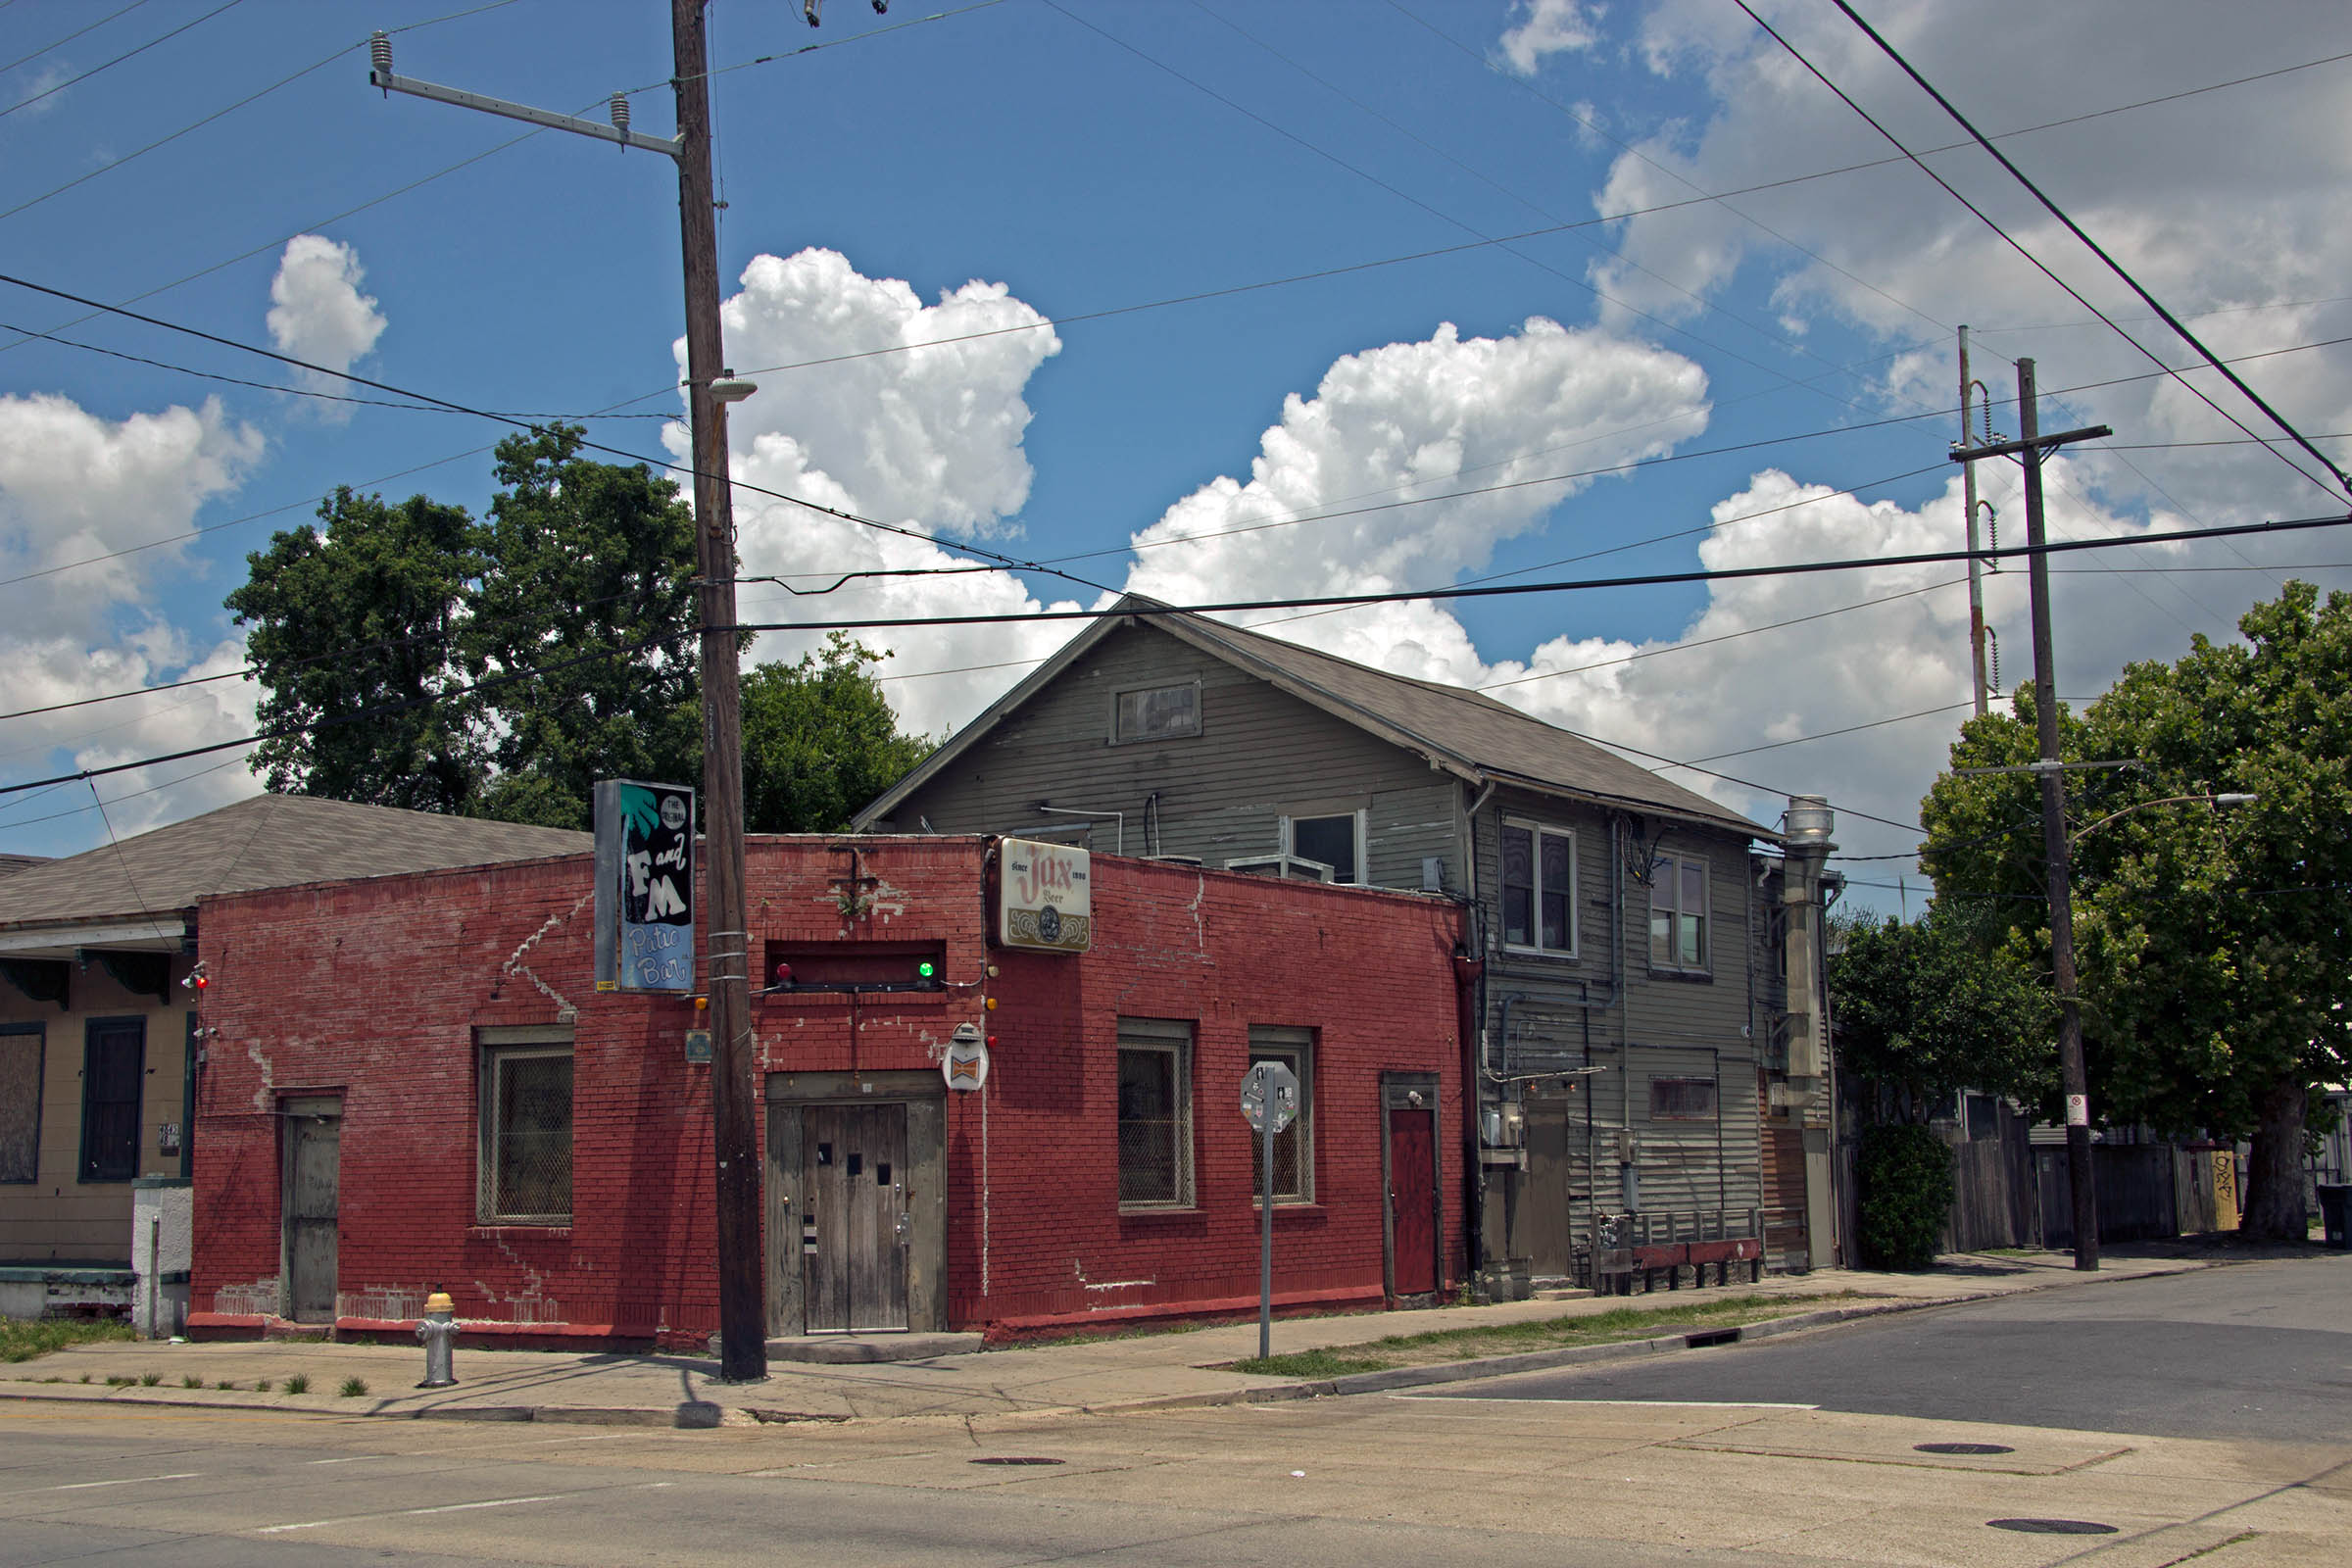 Street scene, Uptown, New Orleans, LA, USA, 2013.